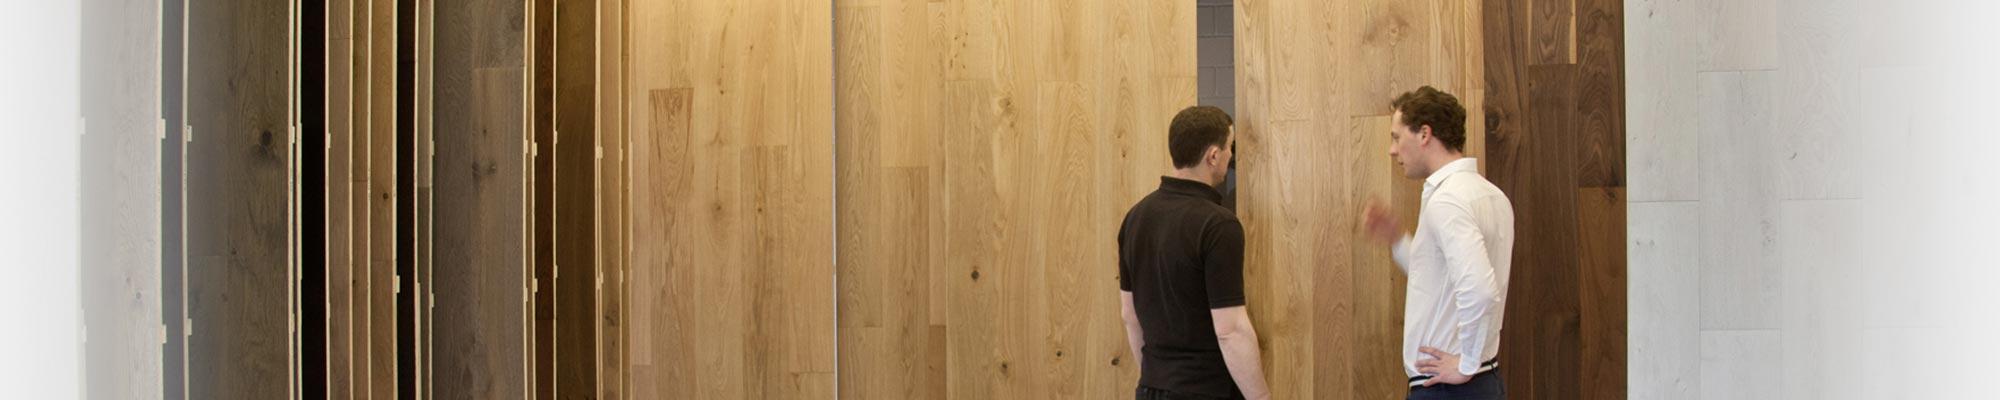 berthold bonn boden kaufen fachhandel f r parkett laminat uvm. Black Bedroom Furniture Sets. Home Design Ideas